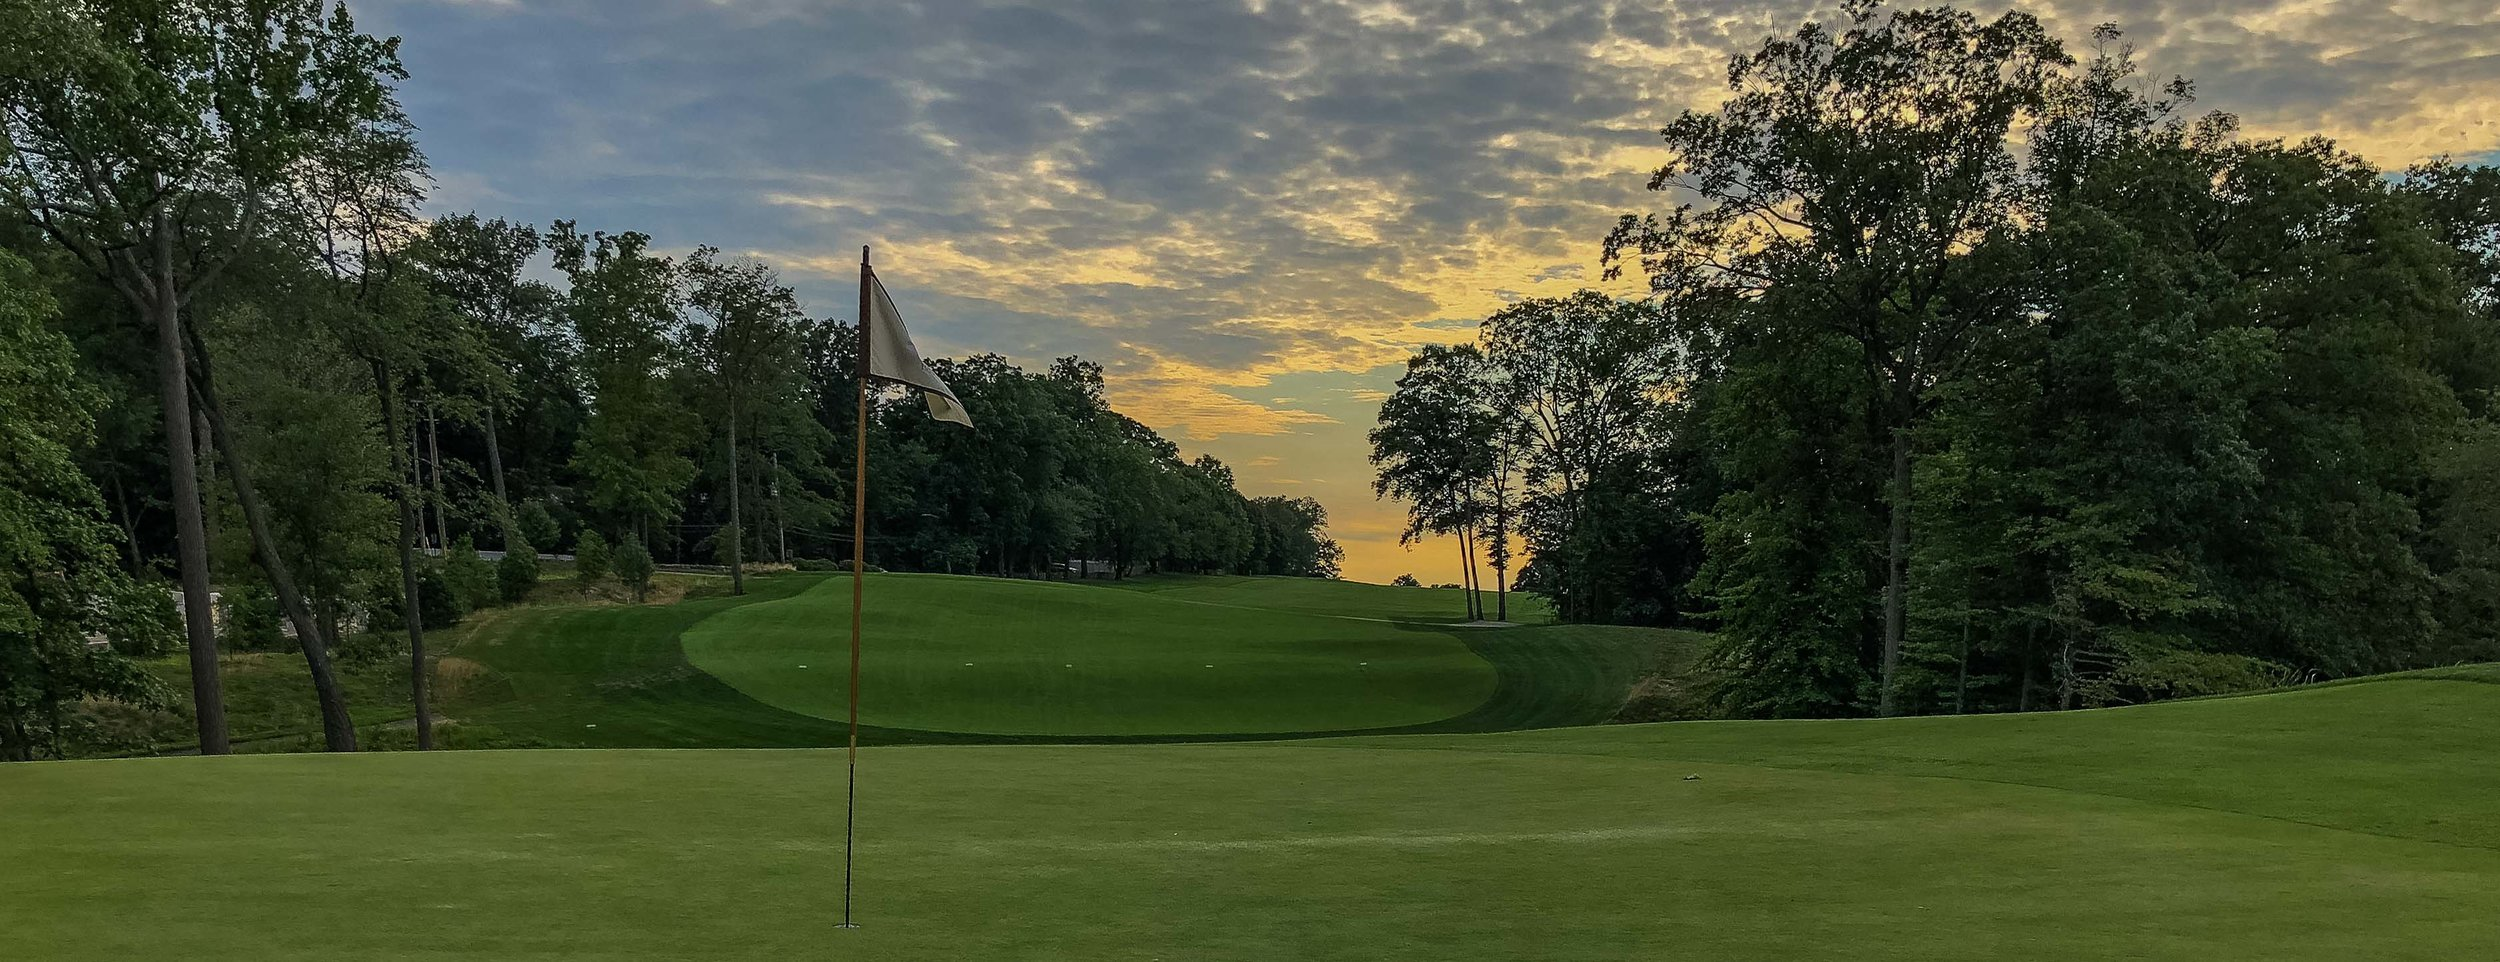 SCC 2018 Golf #16- HAP (1 of 7).jpg